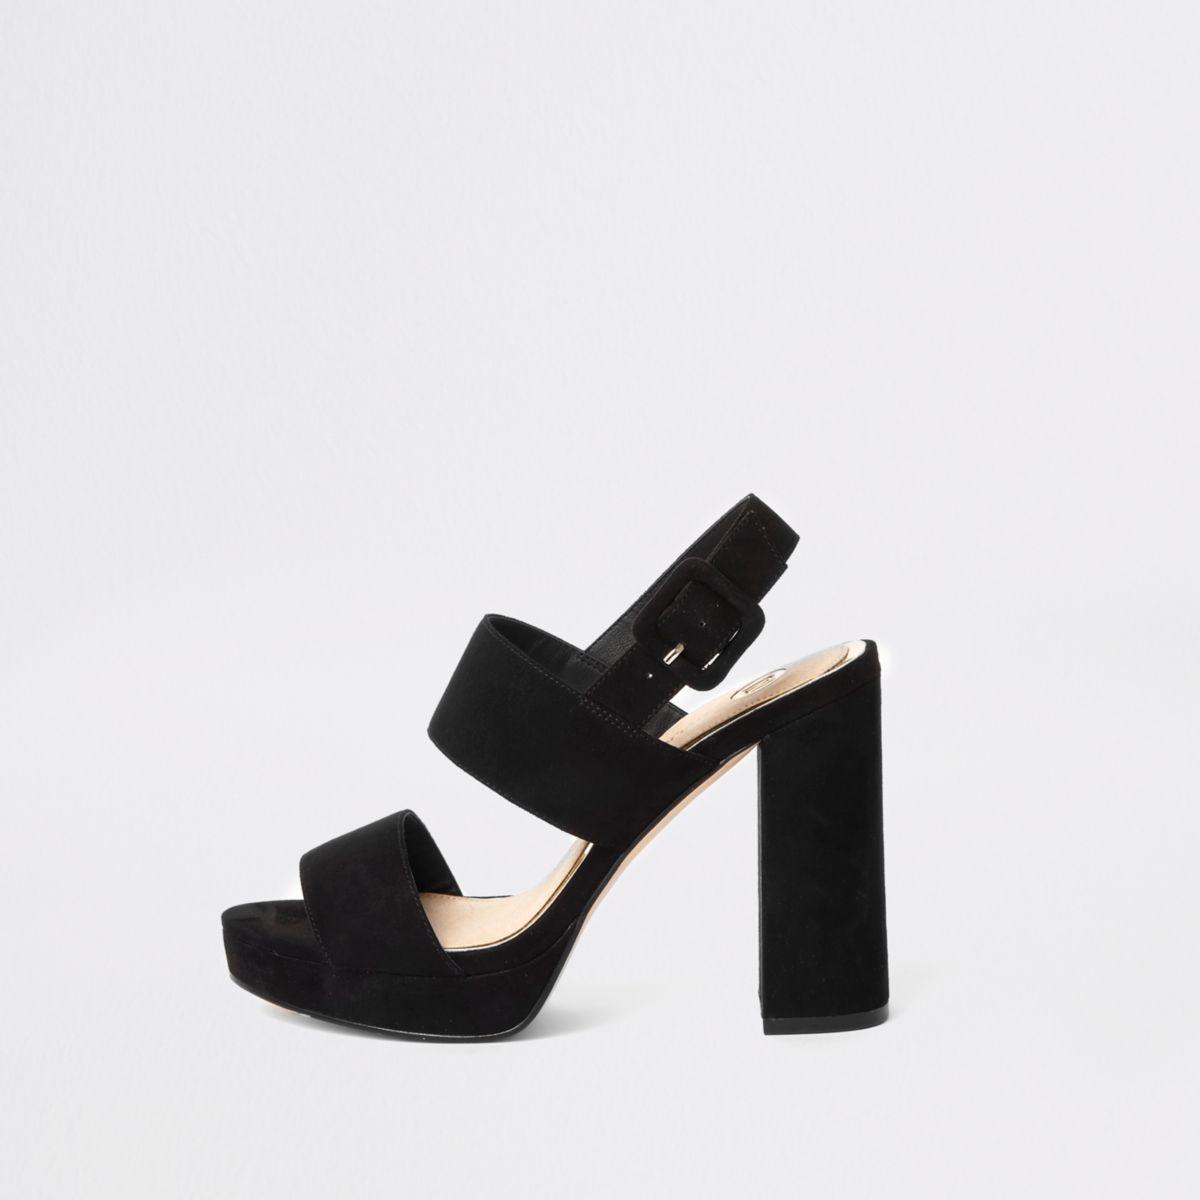 Zwarte sandalen met plateauzool, gesp en bandjes